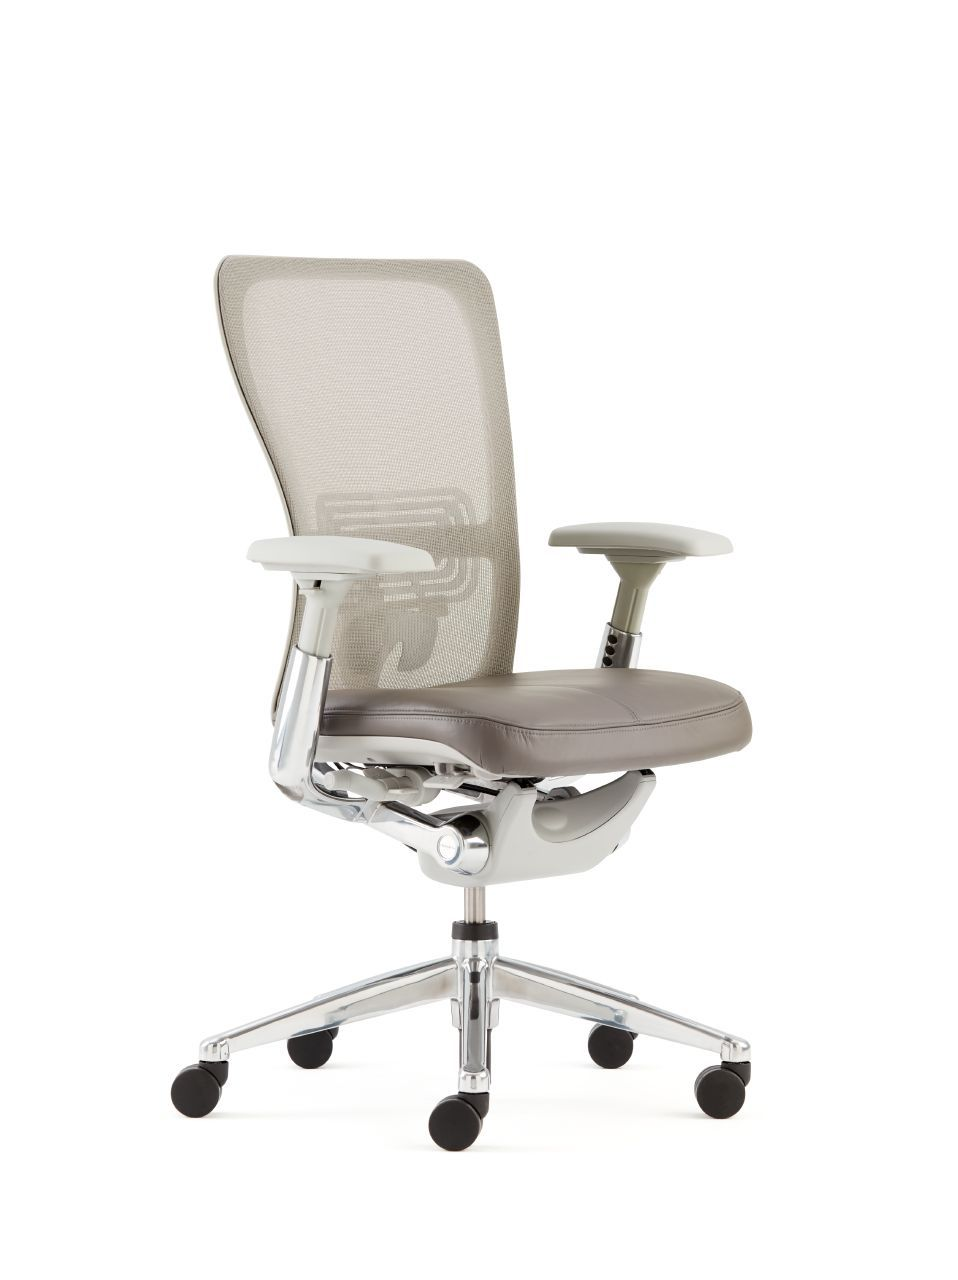 Haworth Zody Chair Chair Desk Chair Ergonomic Desk Chair